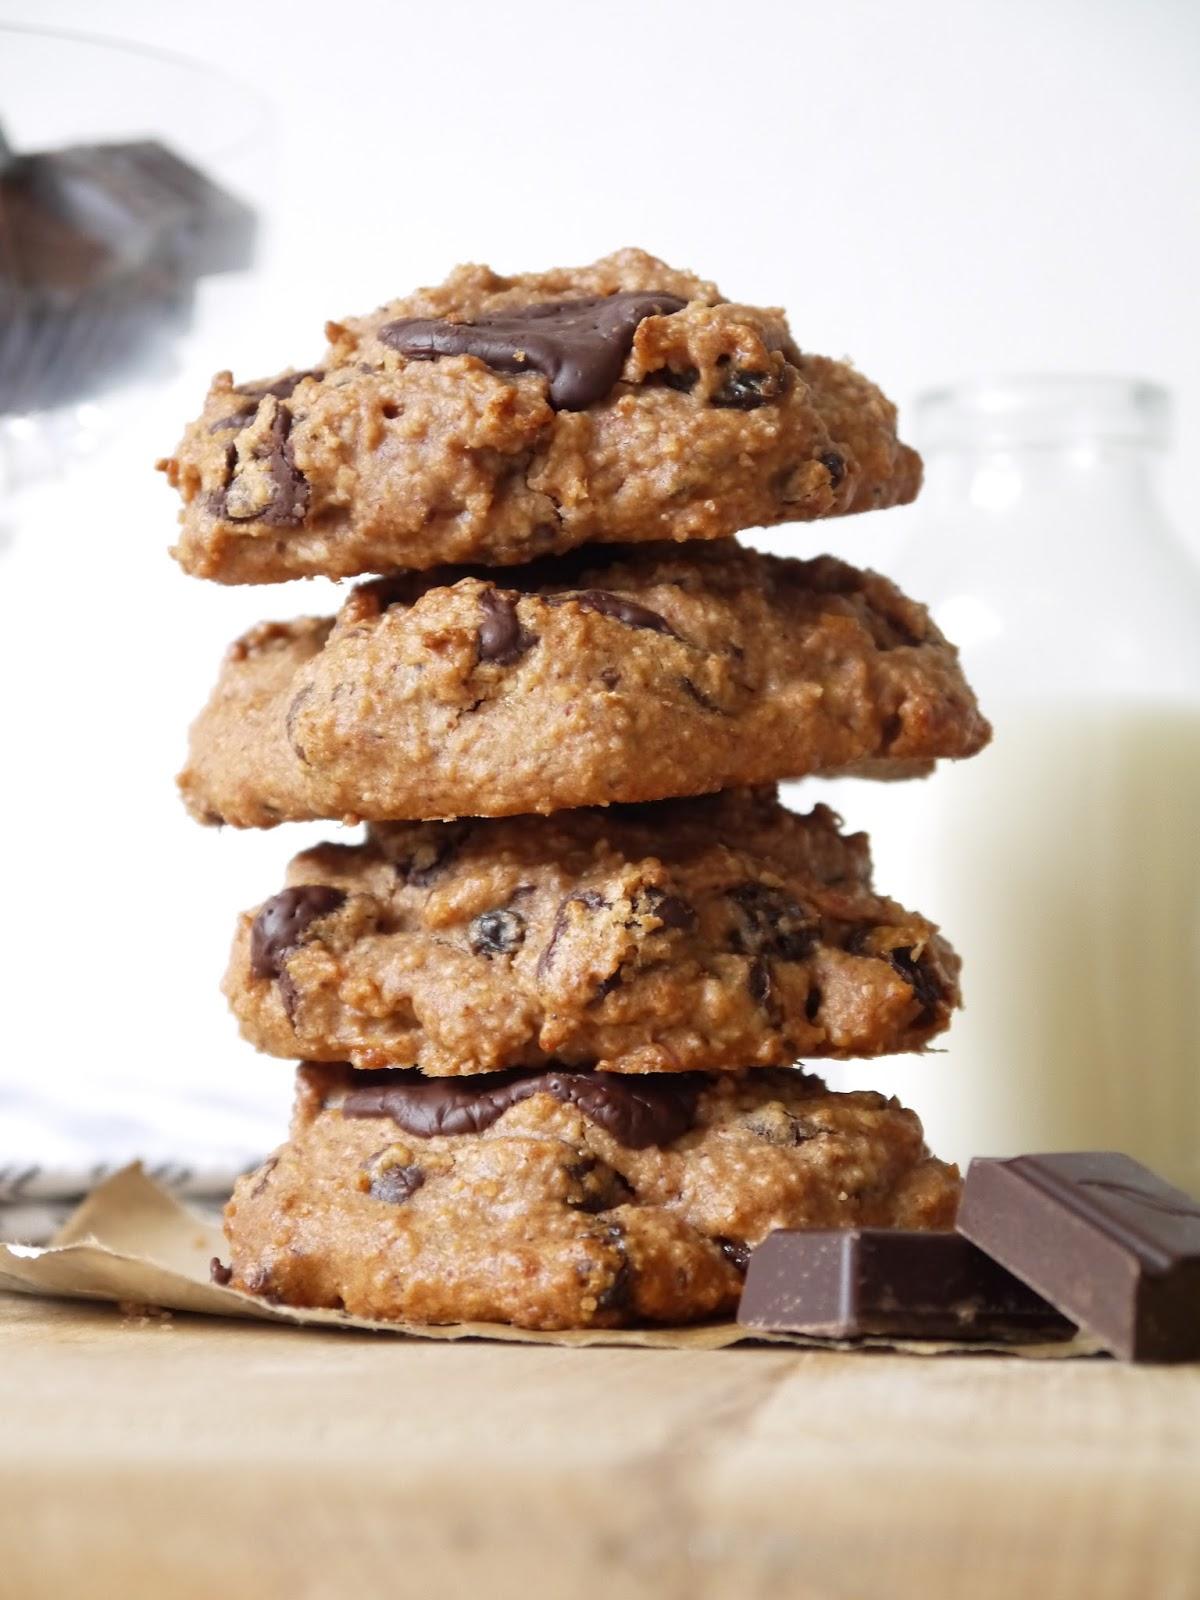 *ZERO BADDIES* Peanut Butter Chocolate Chunk Cookies